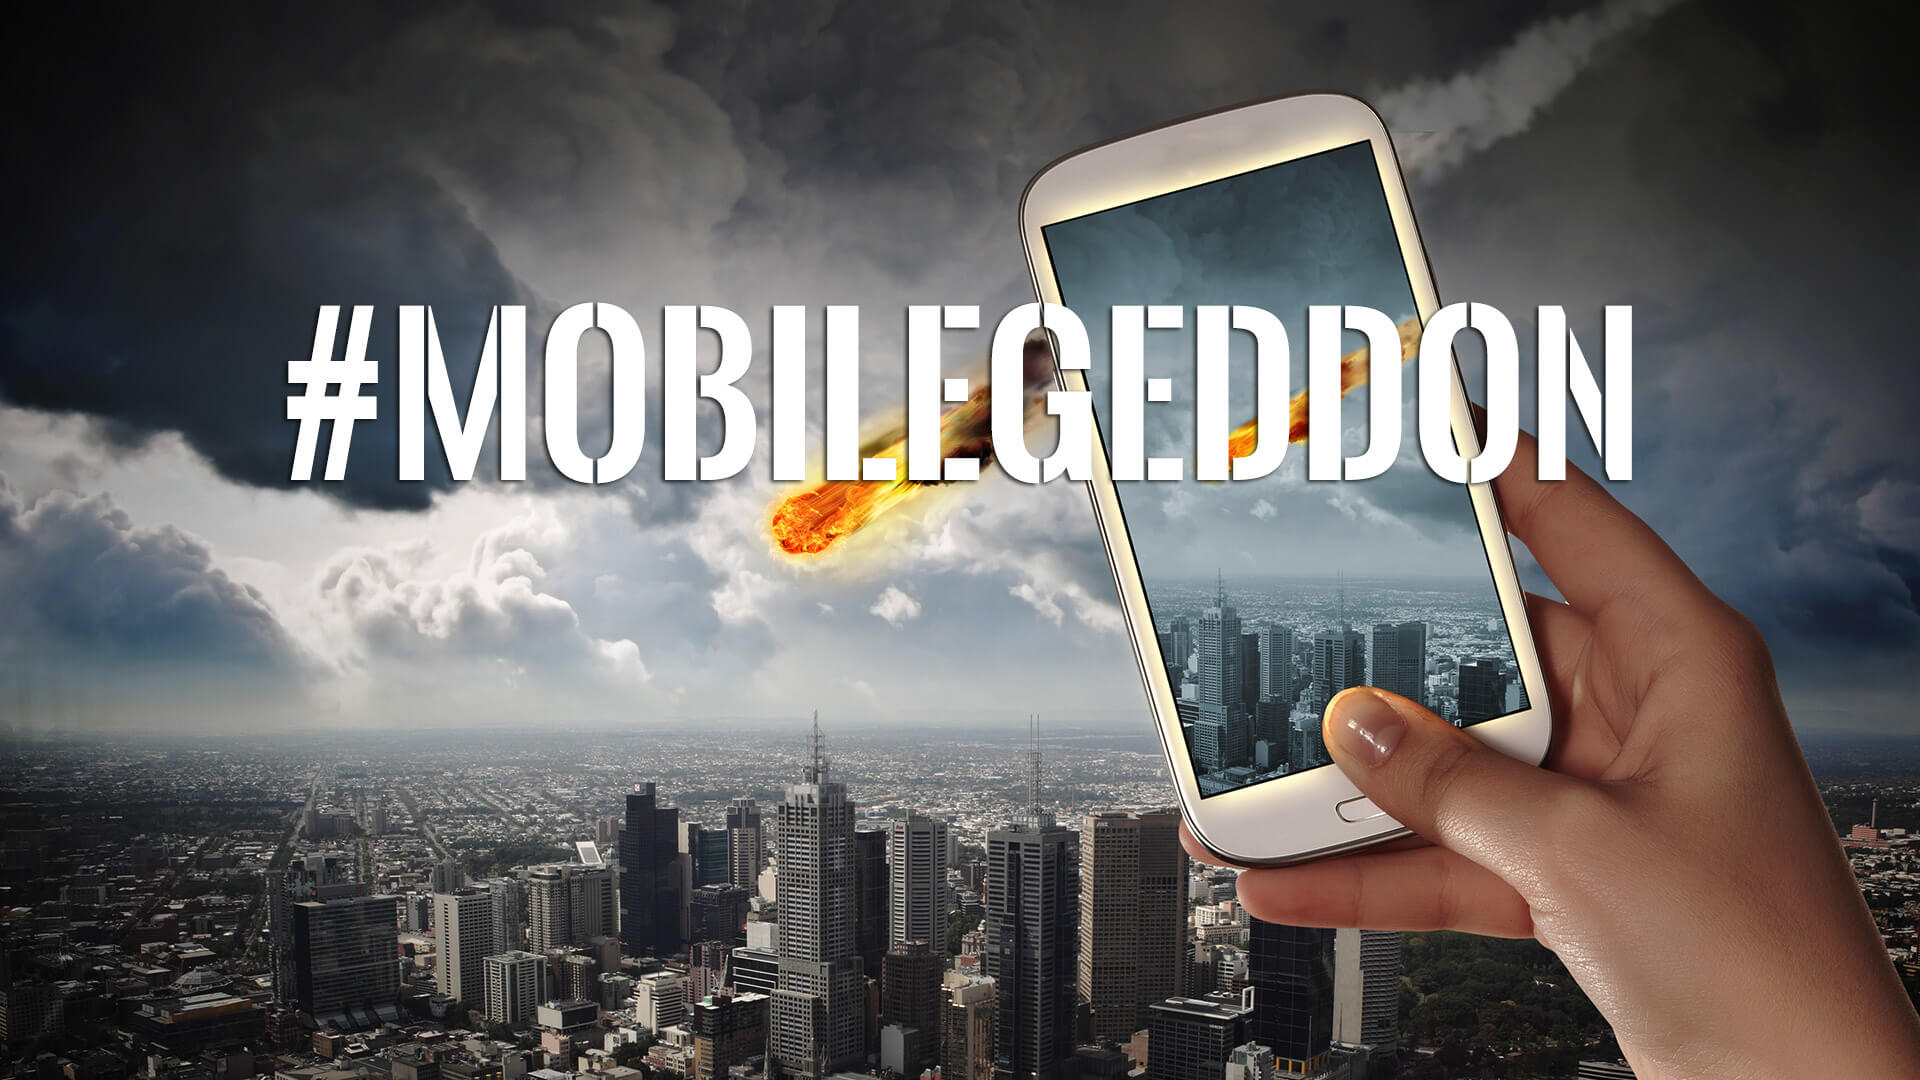 mobilegeddon google